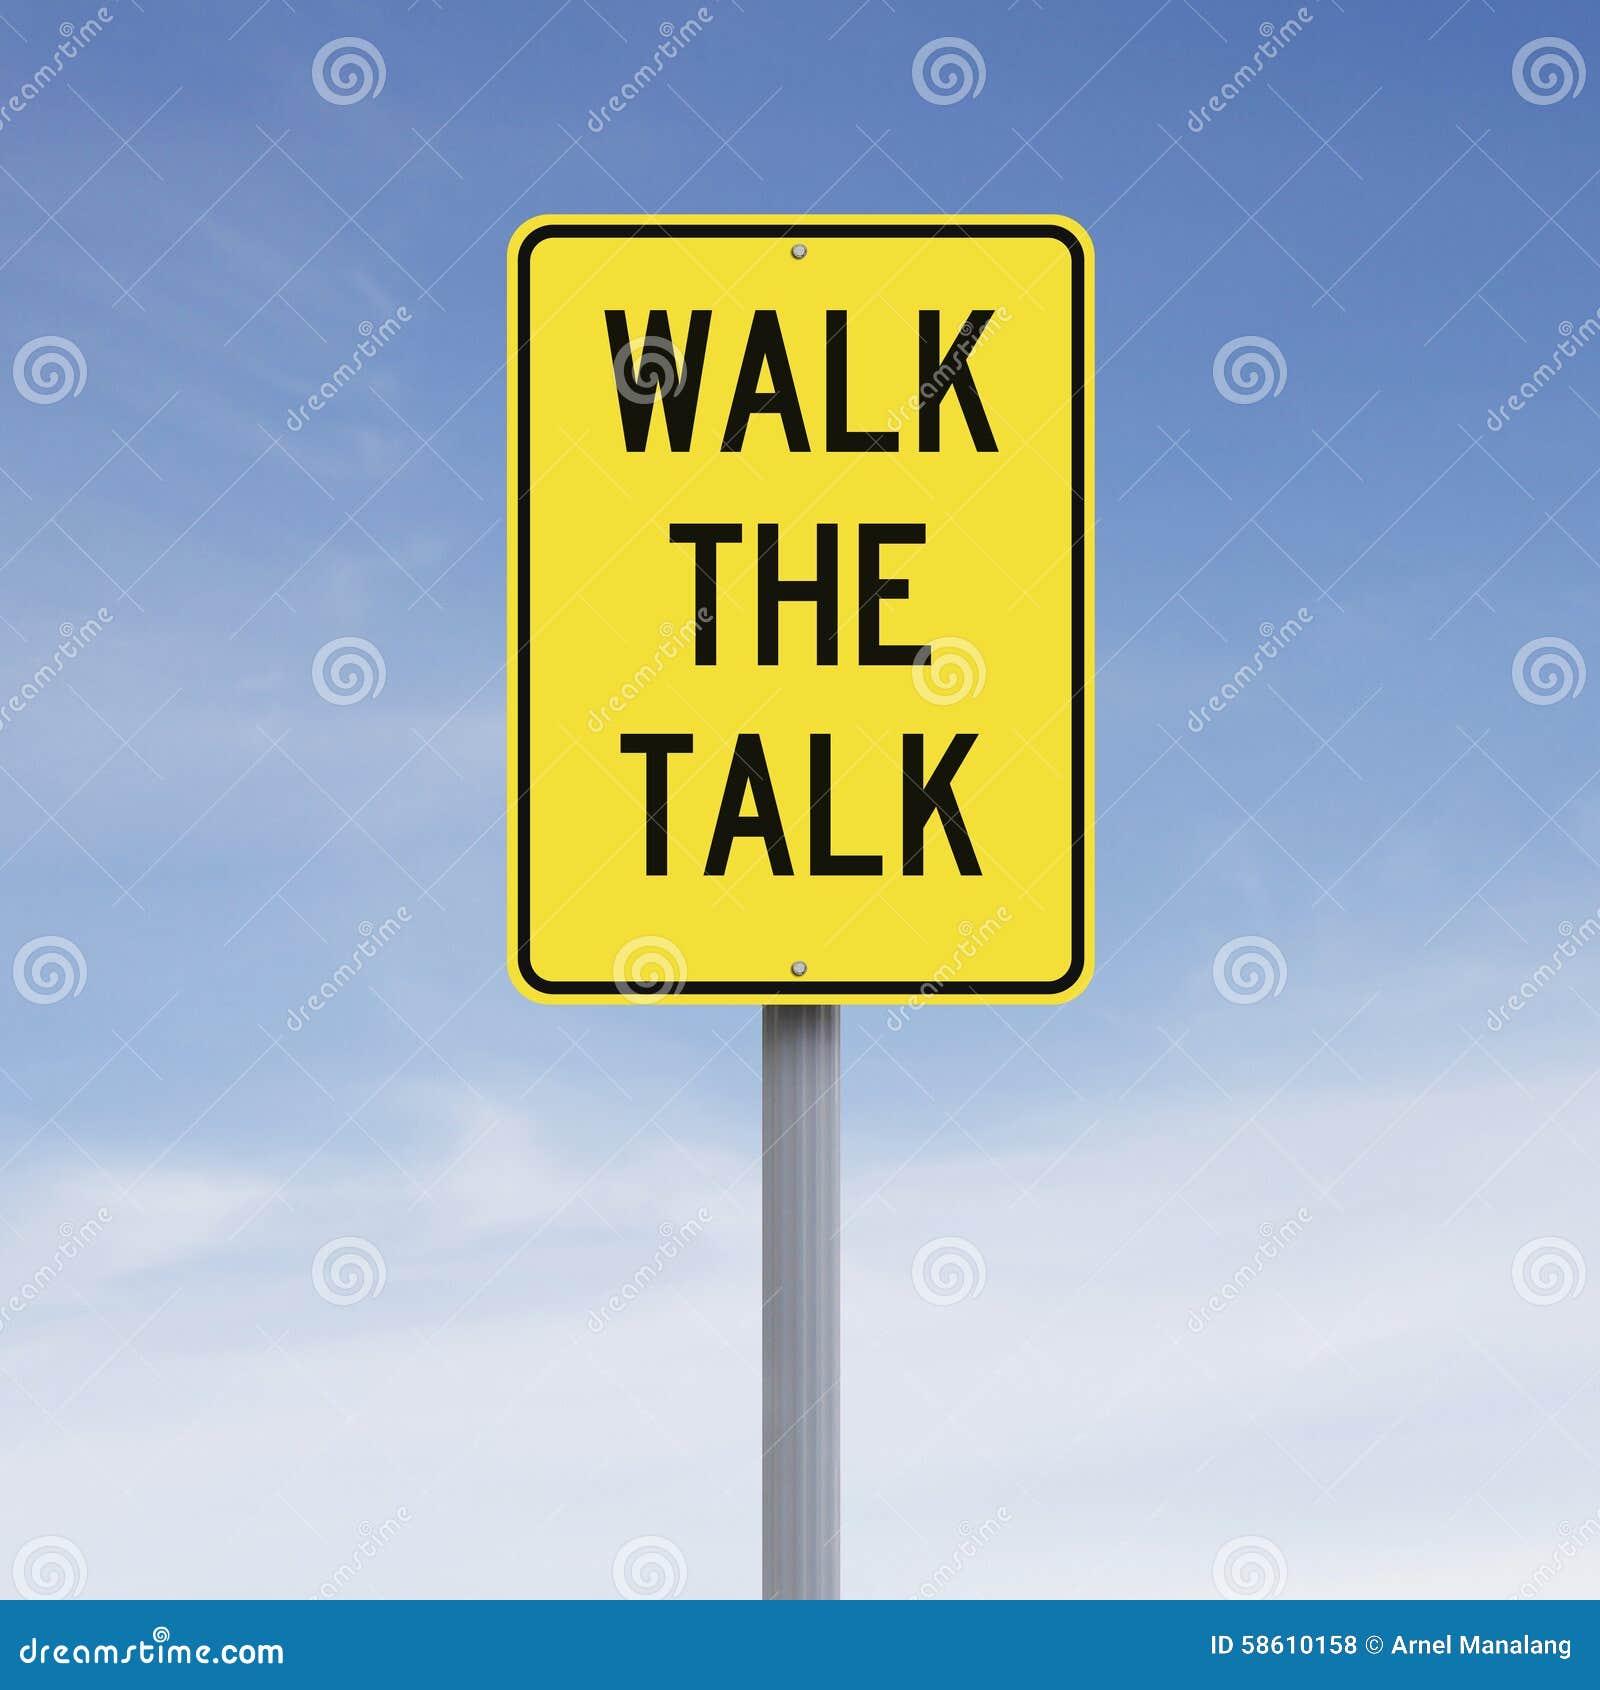 Walk The Talk Stock Photo - Image: 58610158